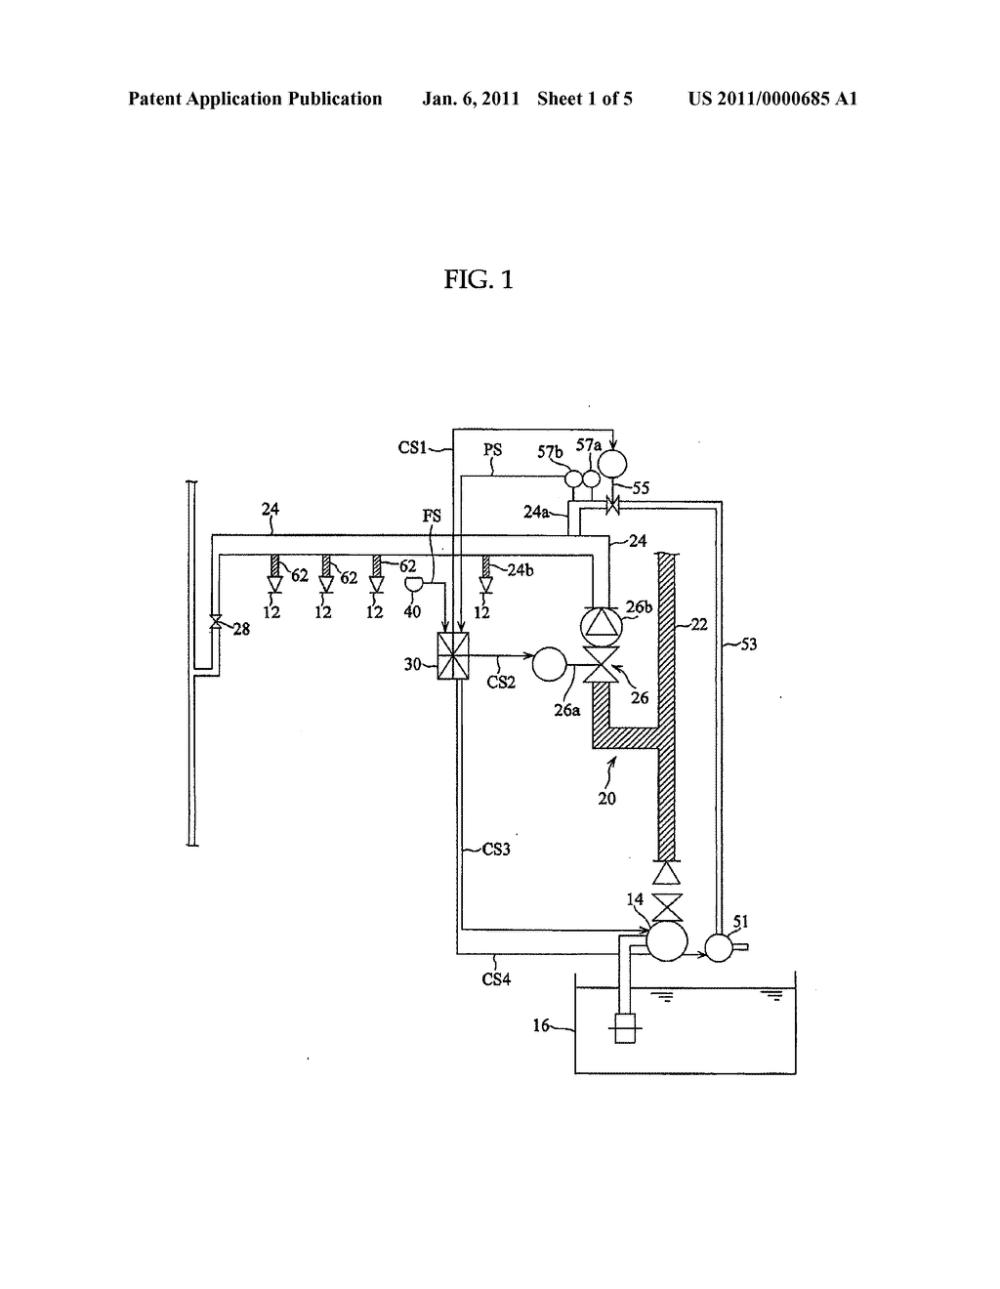 medium resolution of dry type vacuum sprinkler system diagram schematic and image 02 sprinkler system wiring sprinkler system schematic